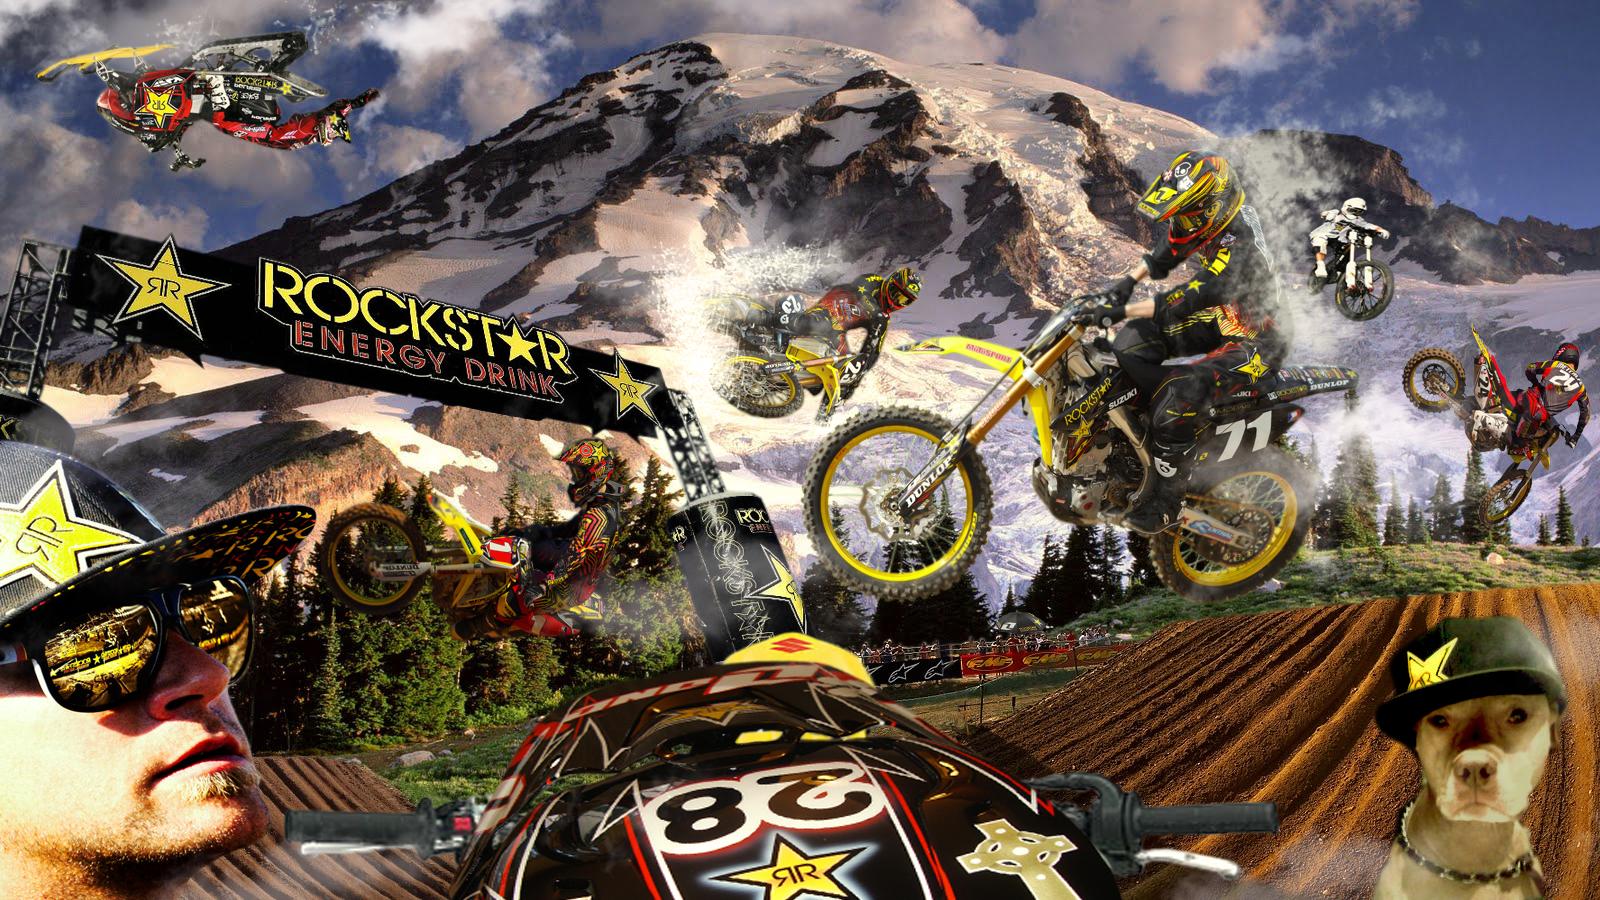 ROCKSTAR ENERGY MOTOCROSS by K4RLSWEDE 1600x900